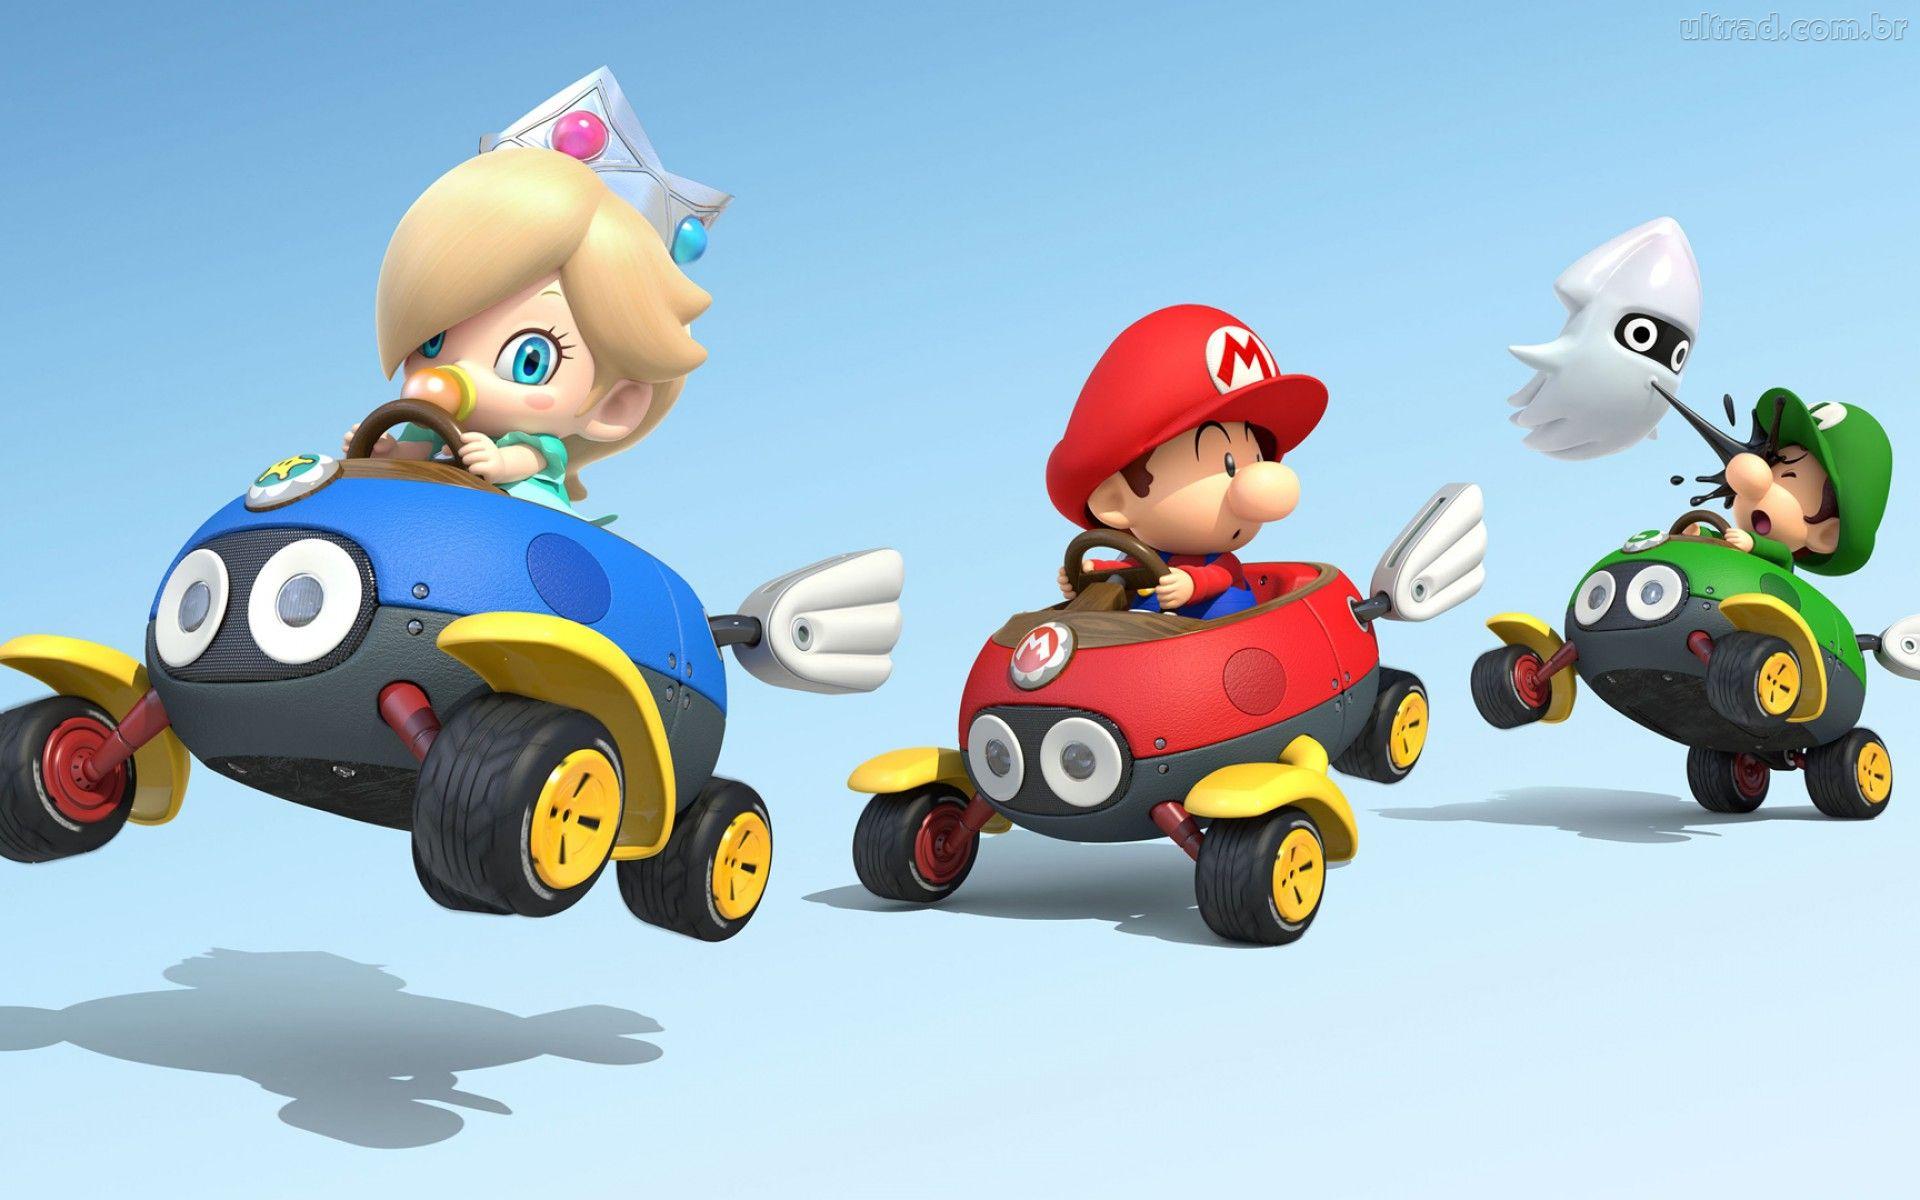 Mario Kart 8 Background: Mario Kart 8 Wallpaper HD